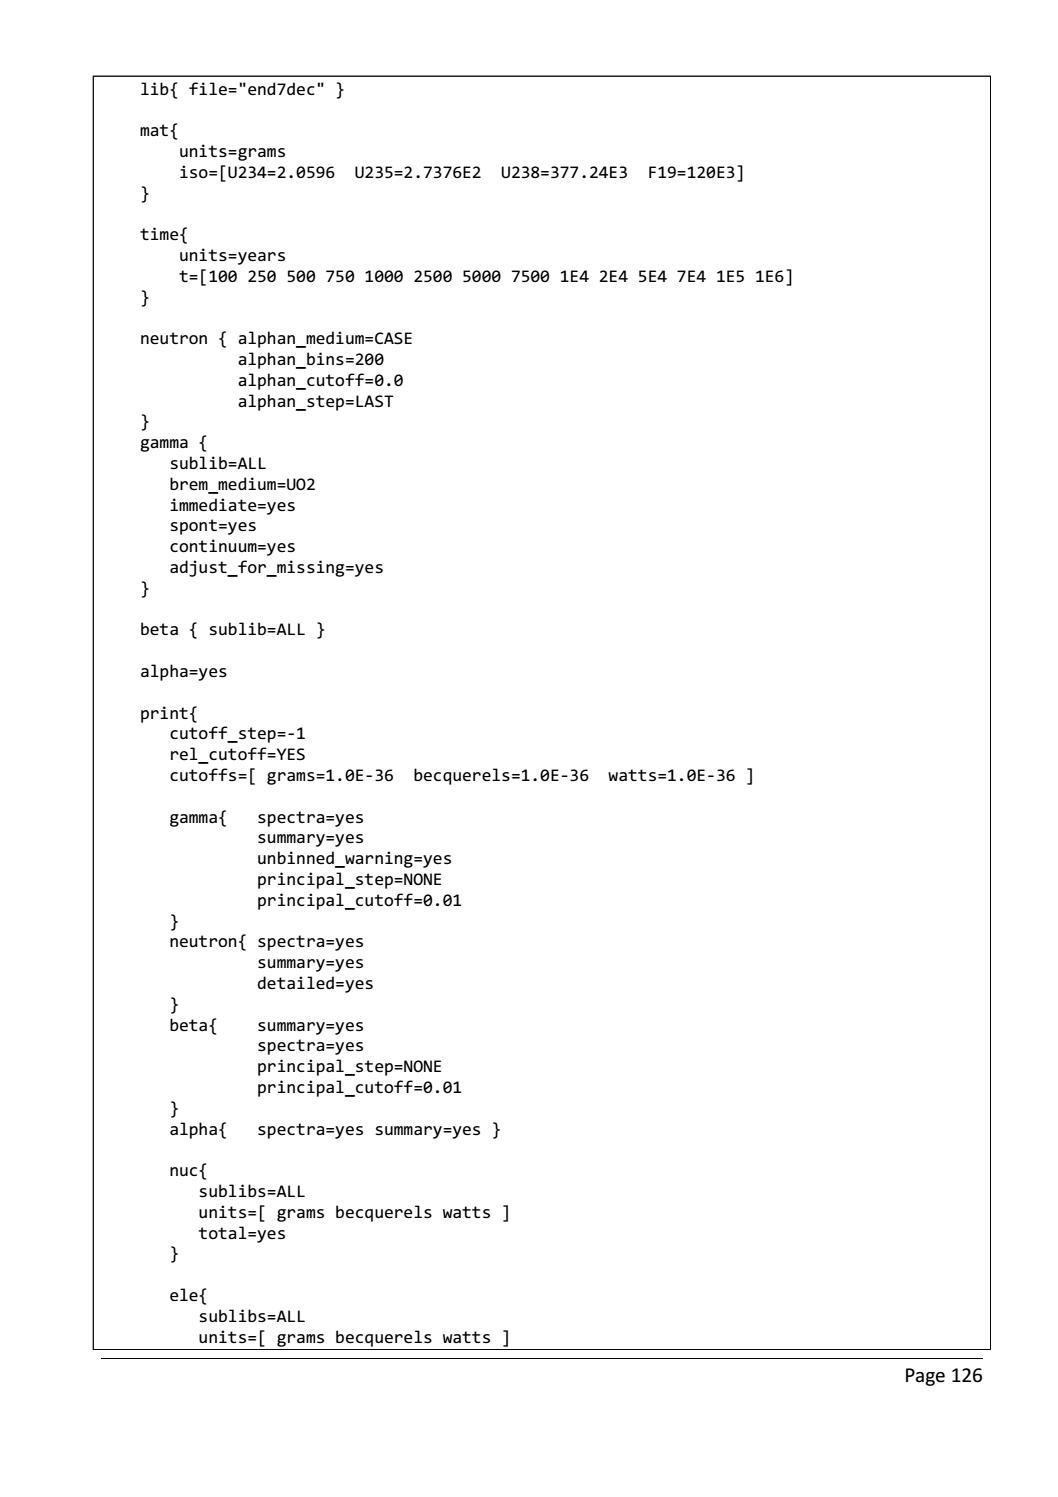 RADIOACTIVE WASTE: COMPUTATIONAL CHARACTERISATION and SHIELDING page 151